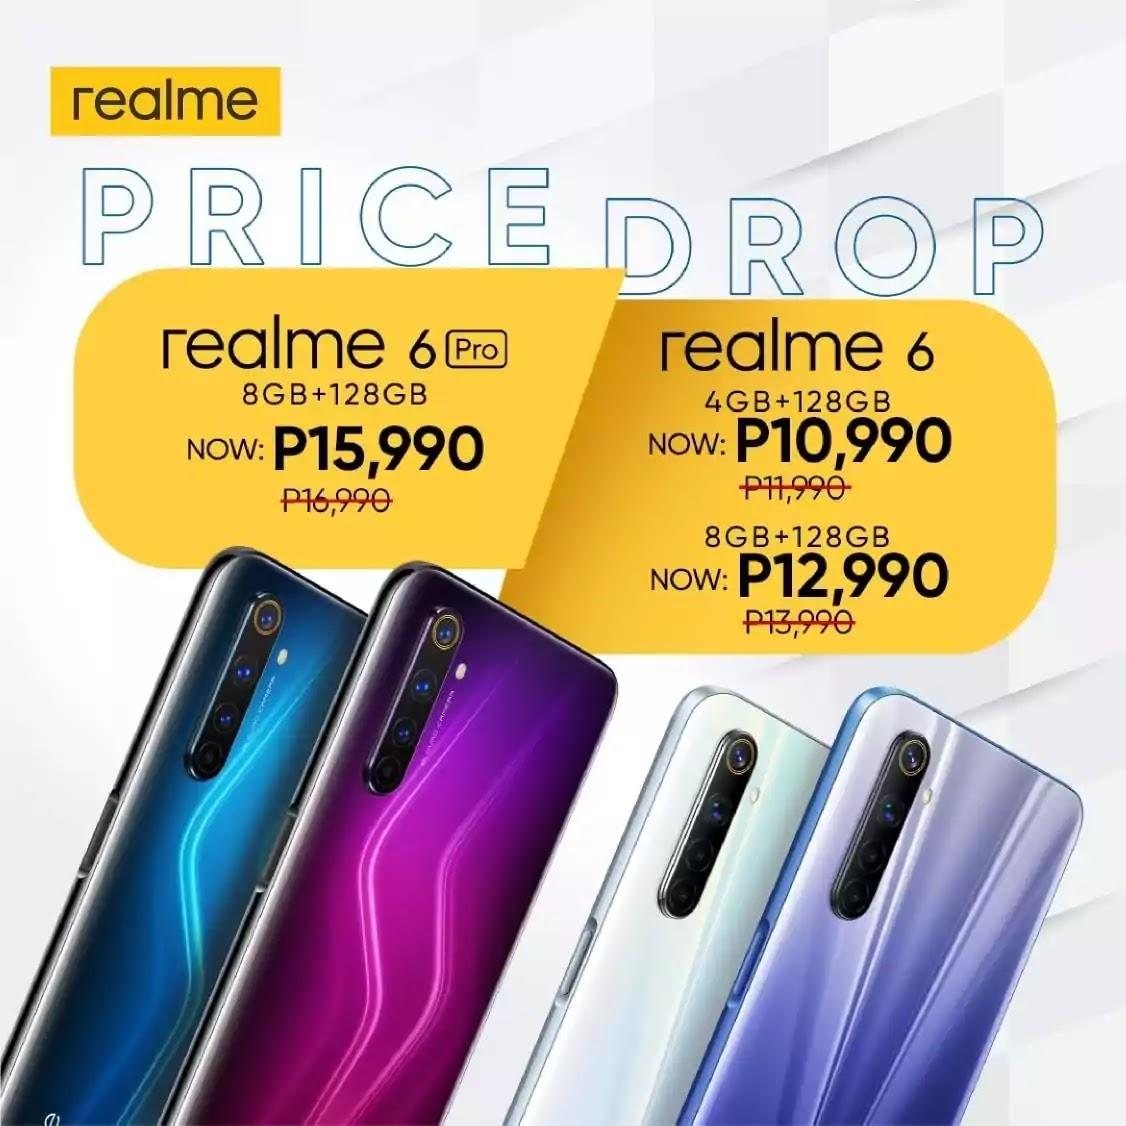 realme 6 and 6 Pro Price Drop